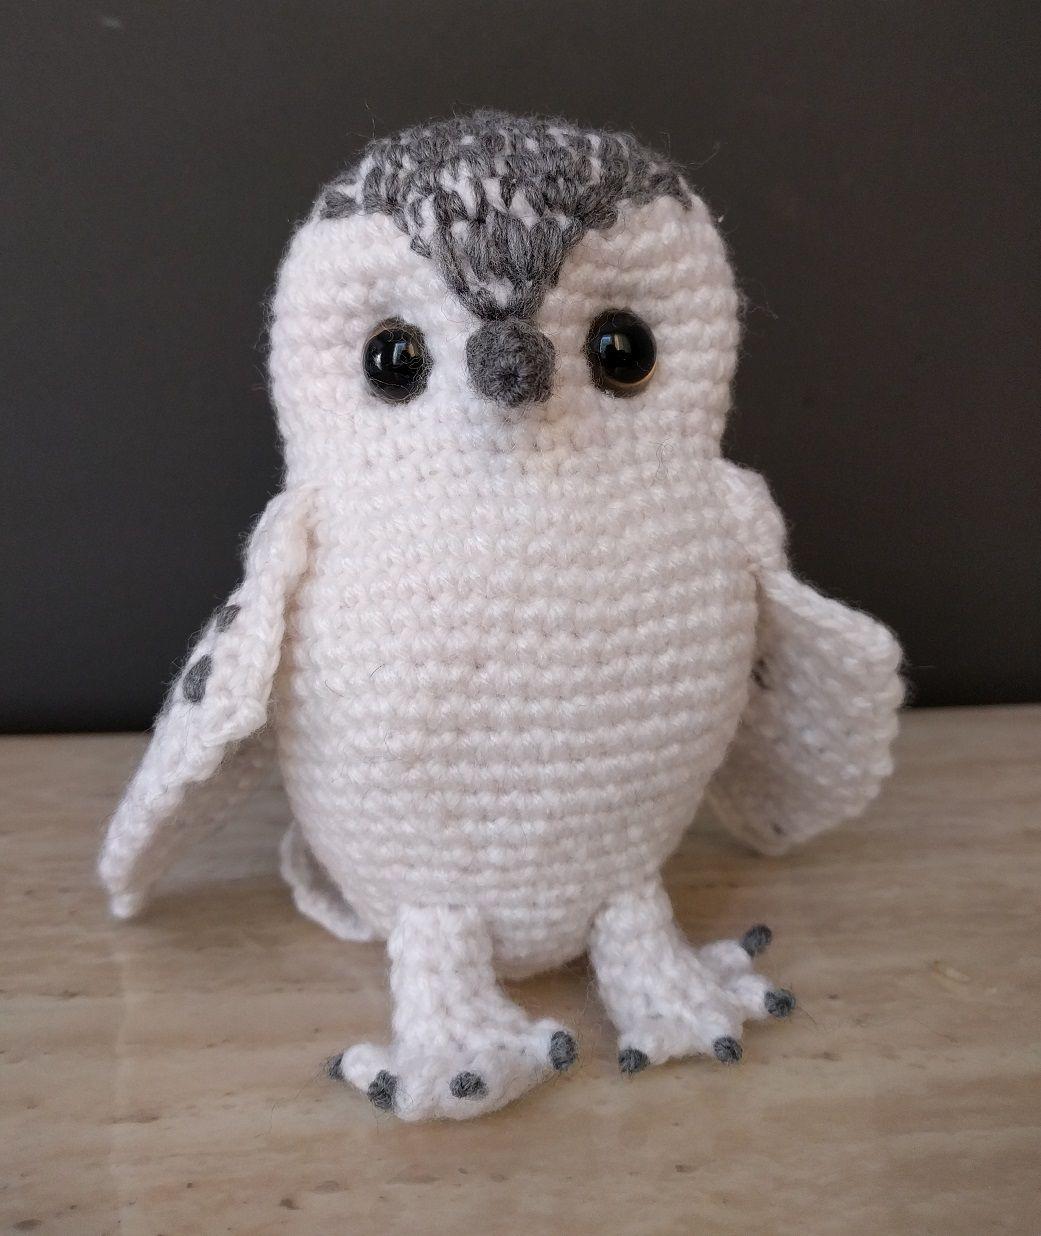 Pin de Erin Irelan en Crochet: Amigurumi | Pinterest | Muñecos de ...